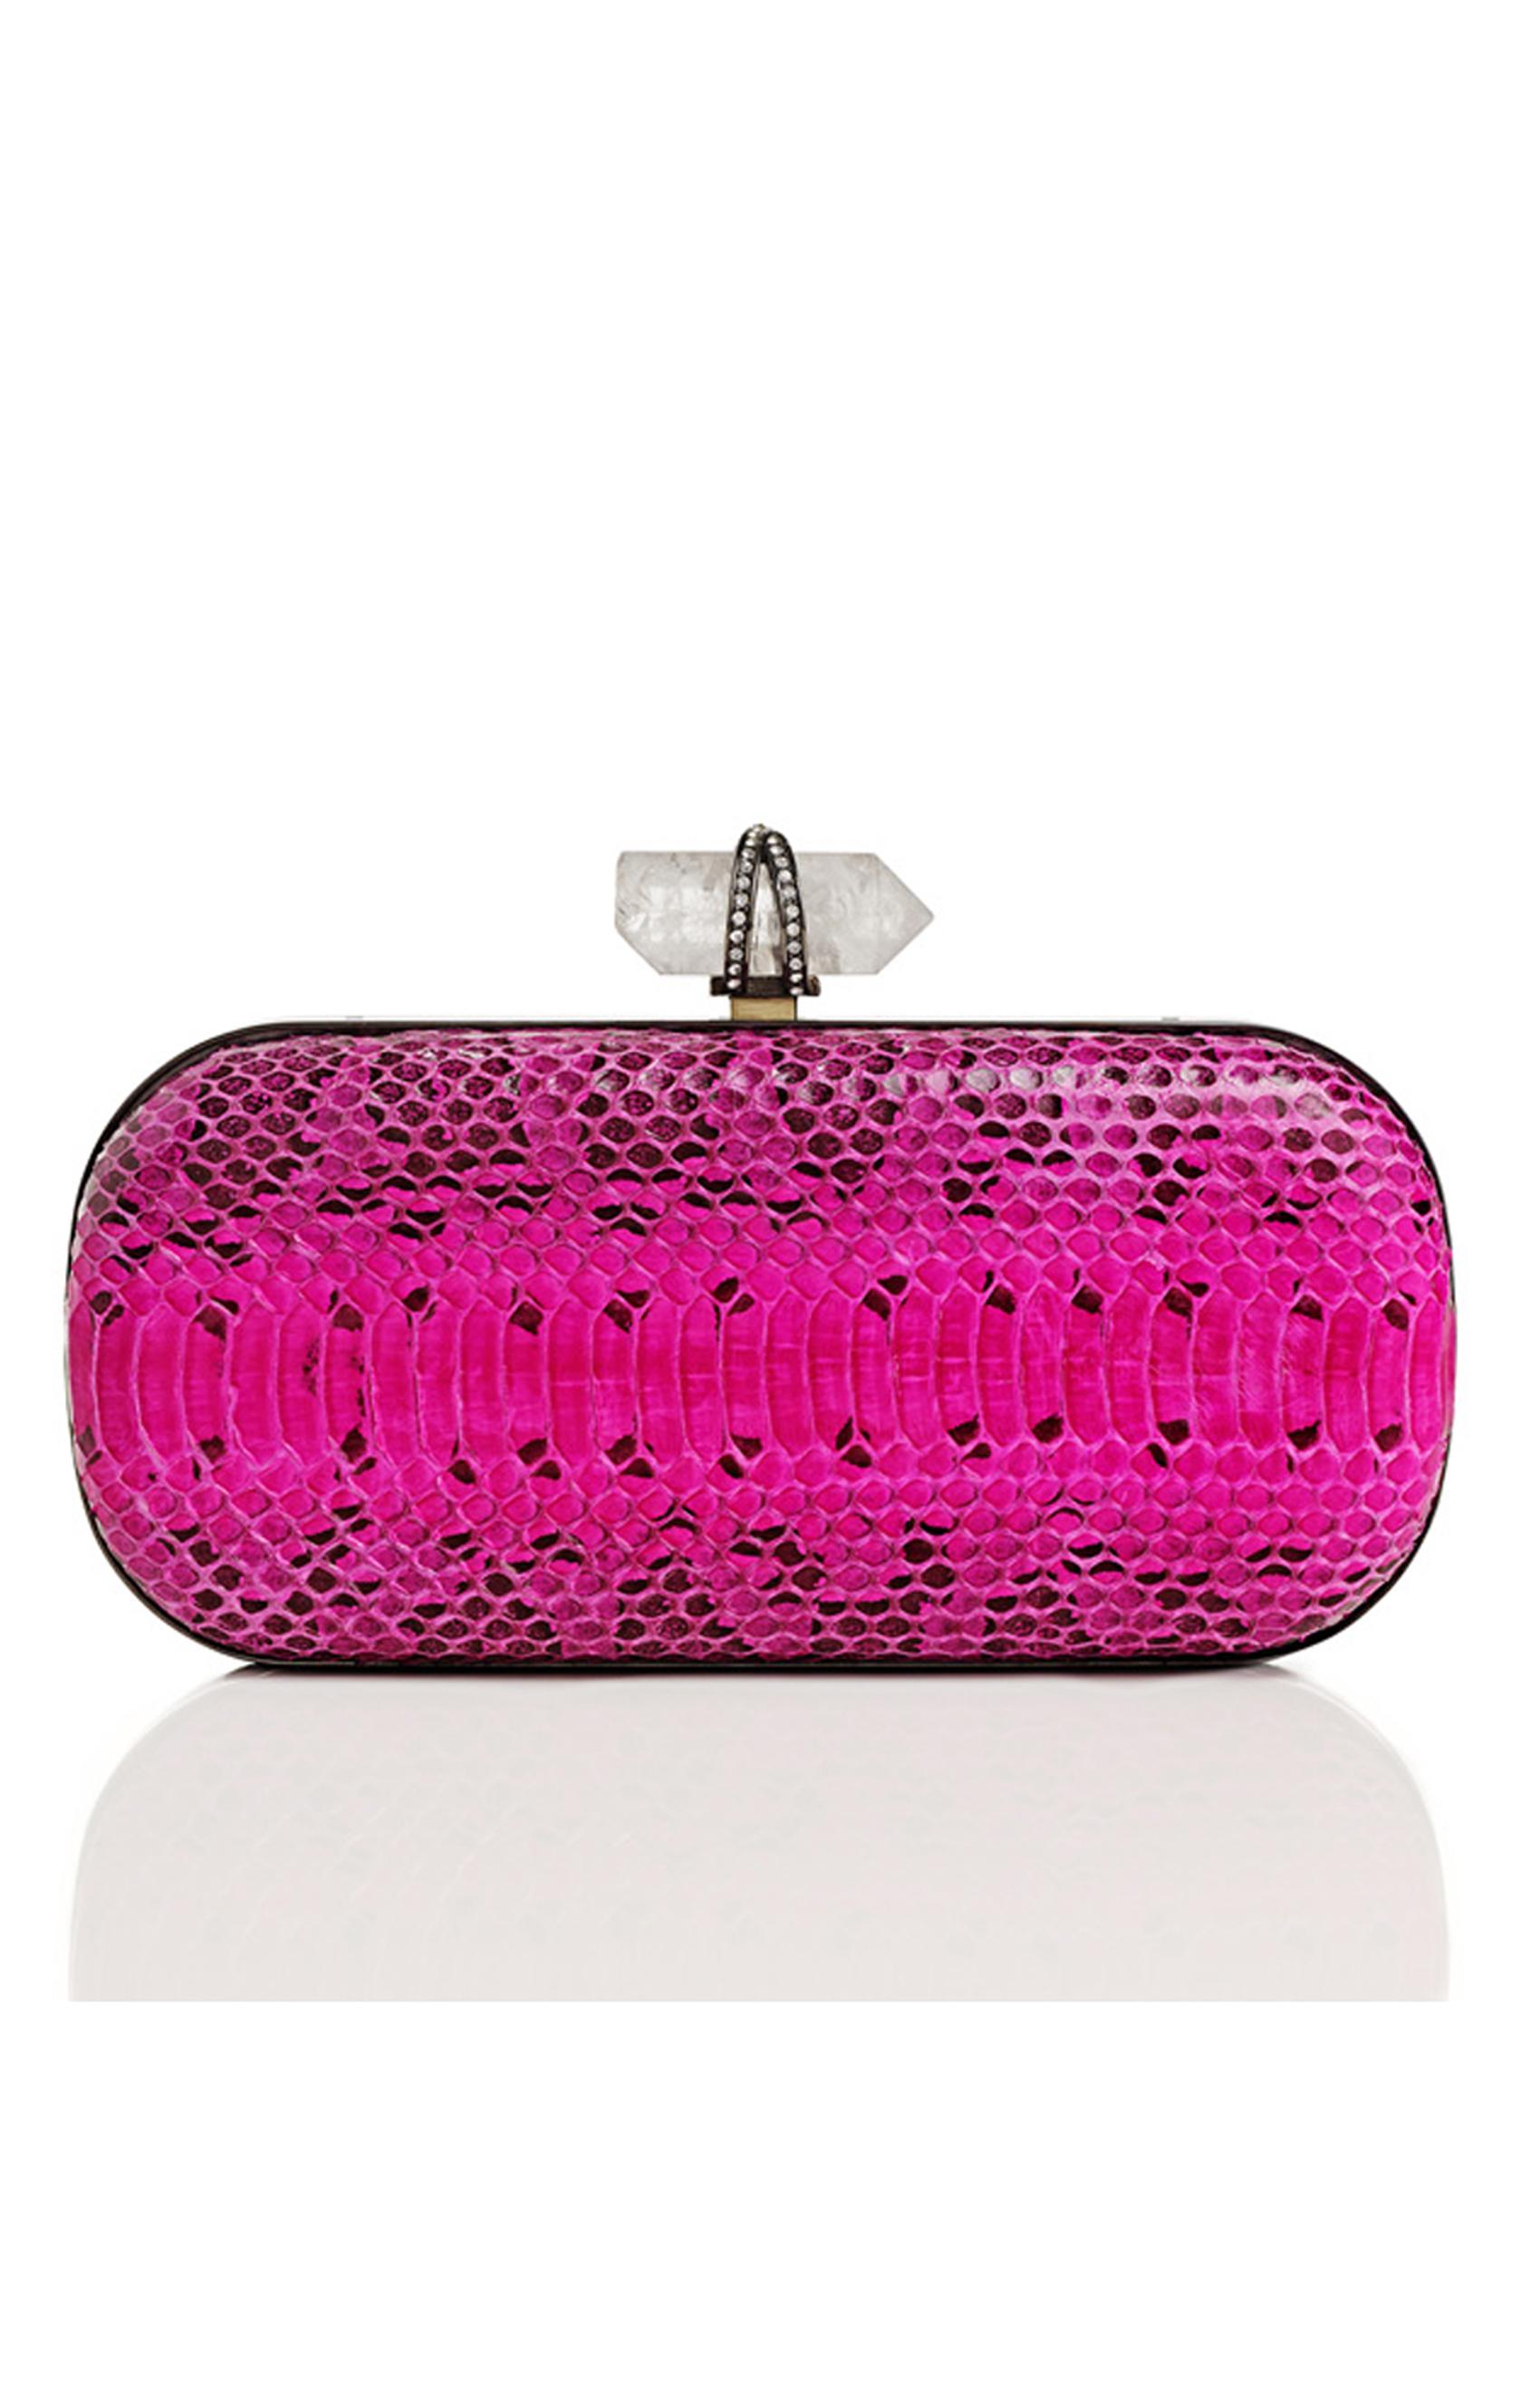 Marchesa <br>Handbag 05